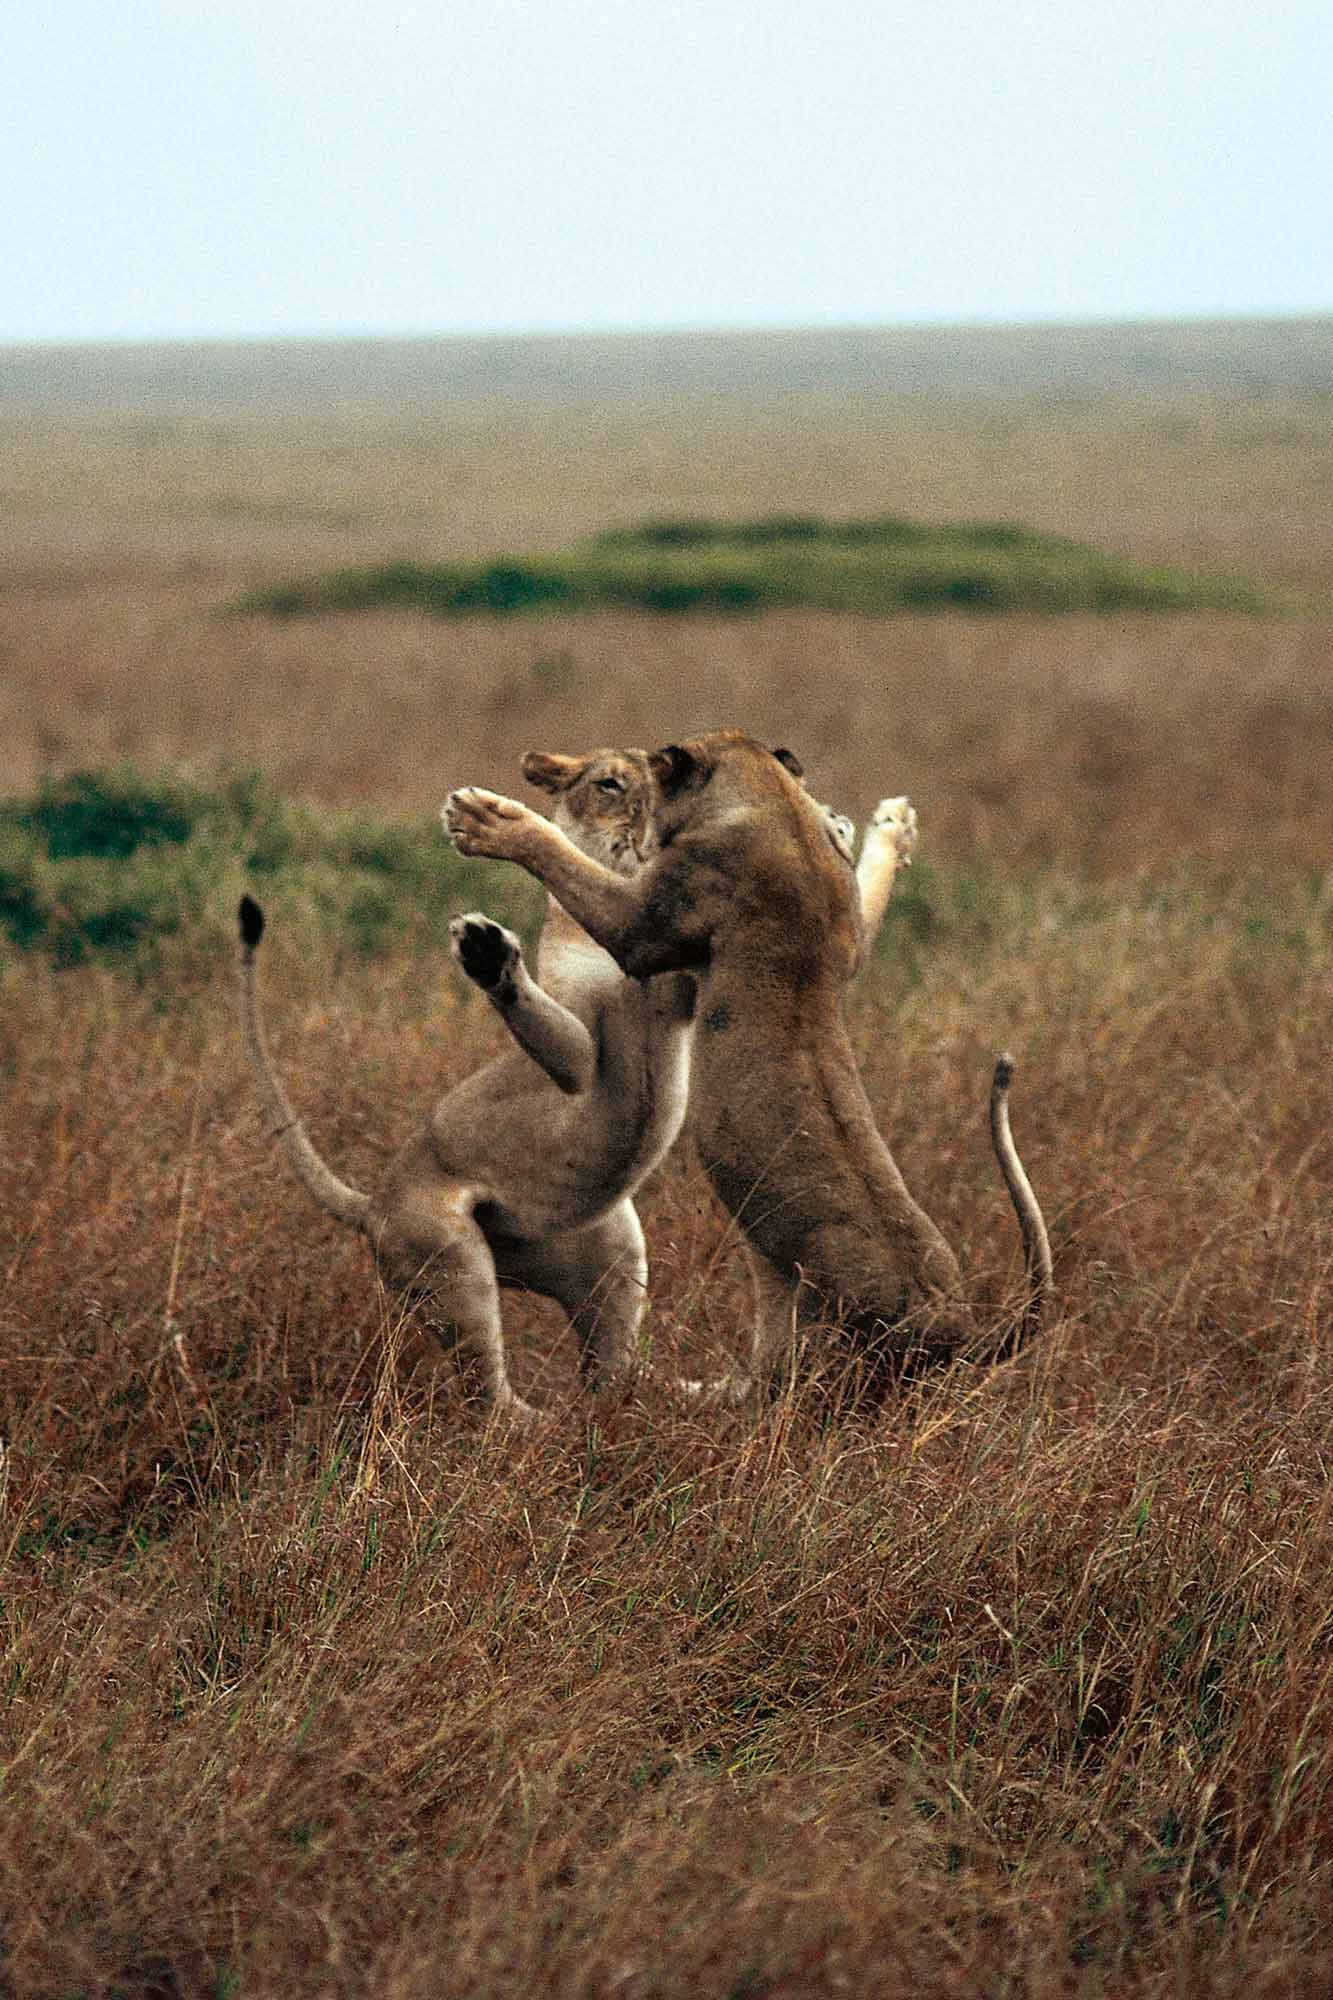 Lionnes - Yann Arthus-Bertrand